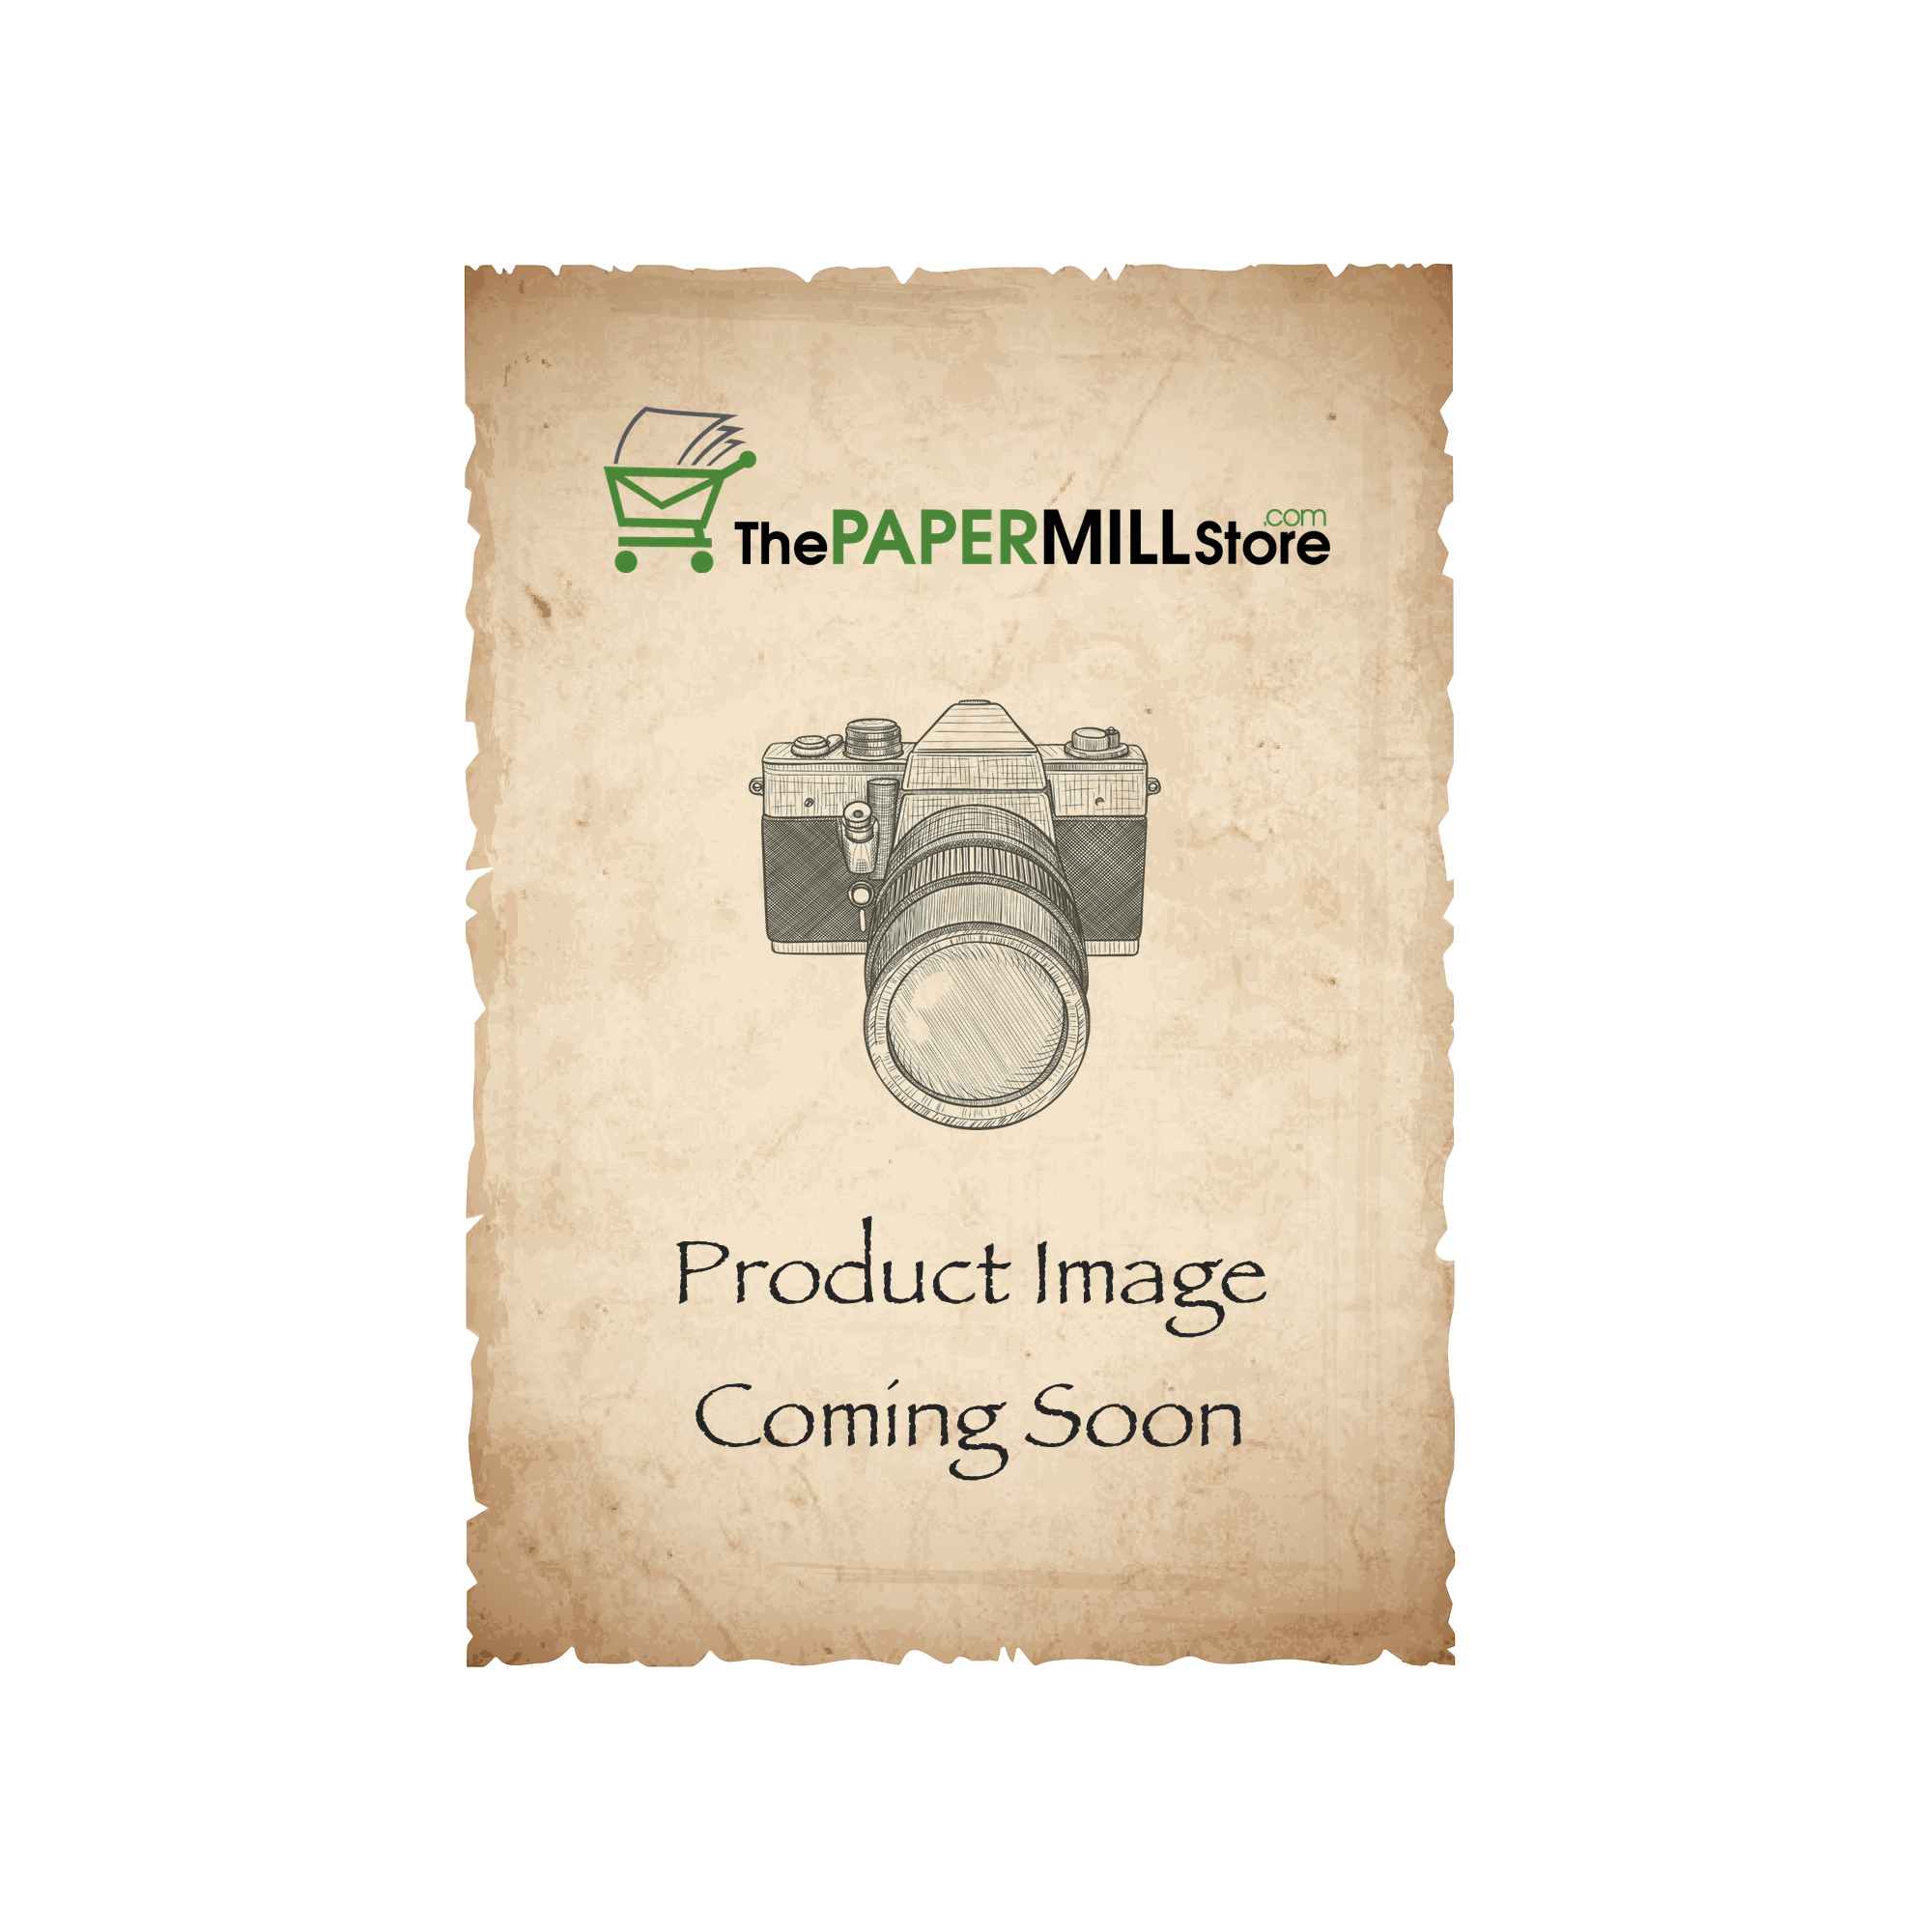 CLASSIC Linen Sage Green Envelopes - A2 (4 3/8 x 5 3/4) 80 lb Text Linen  30% Recycled 1000 per Carton